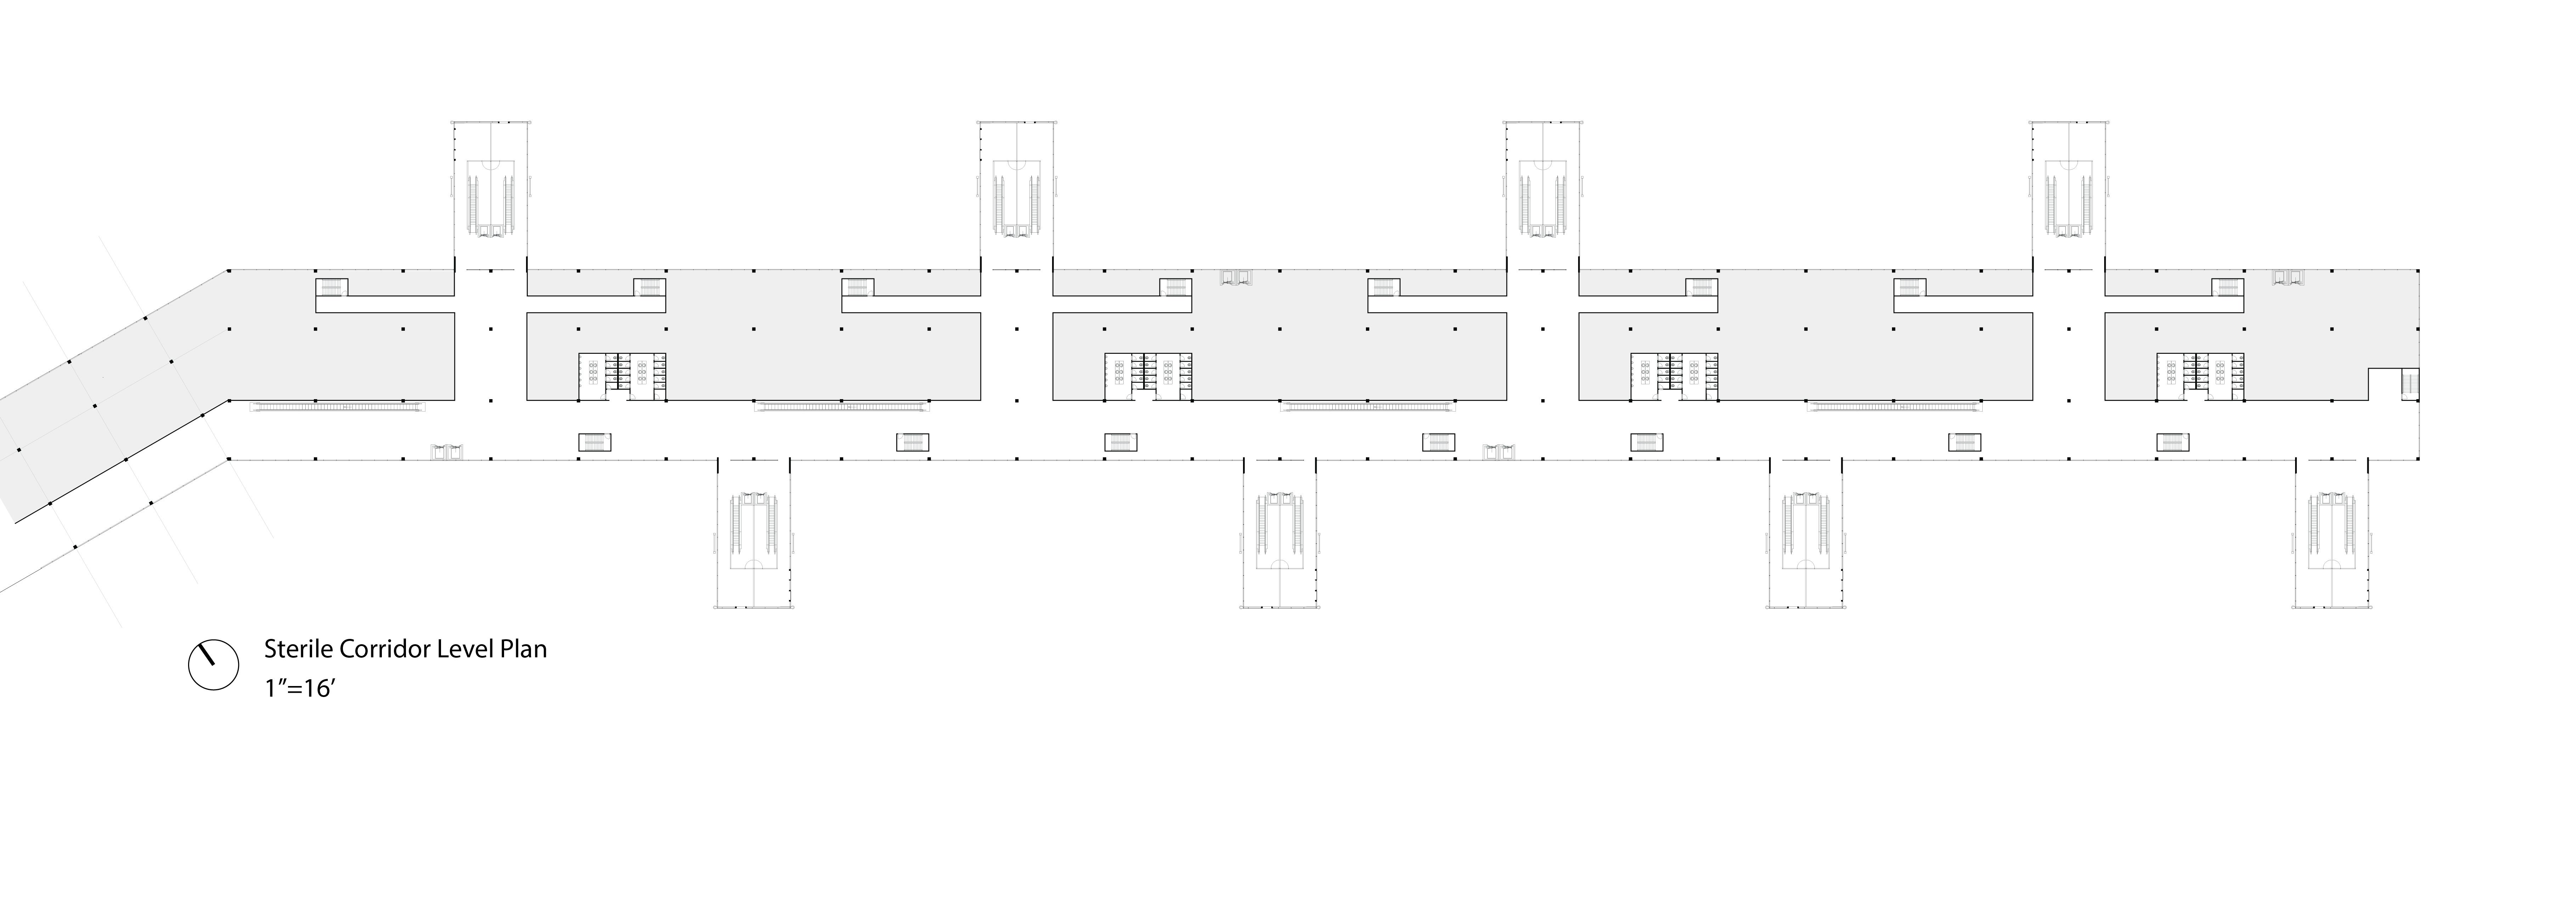 Sterile Corridor Level Plan